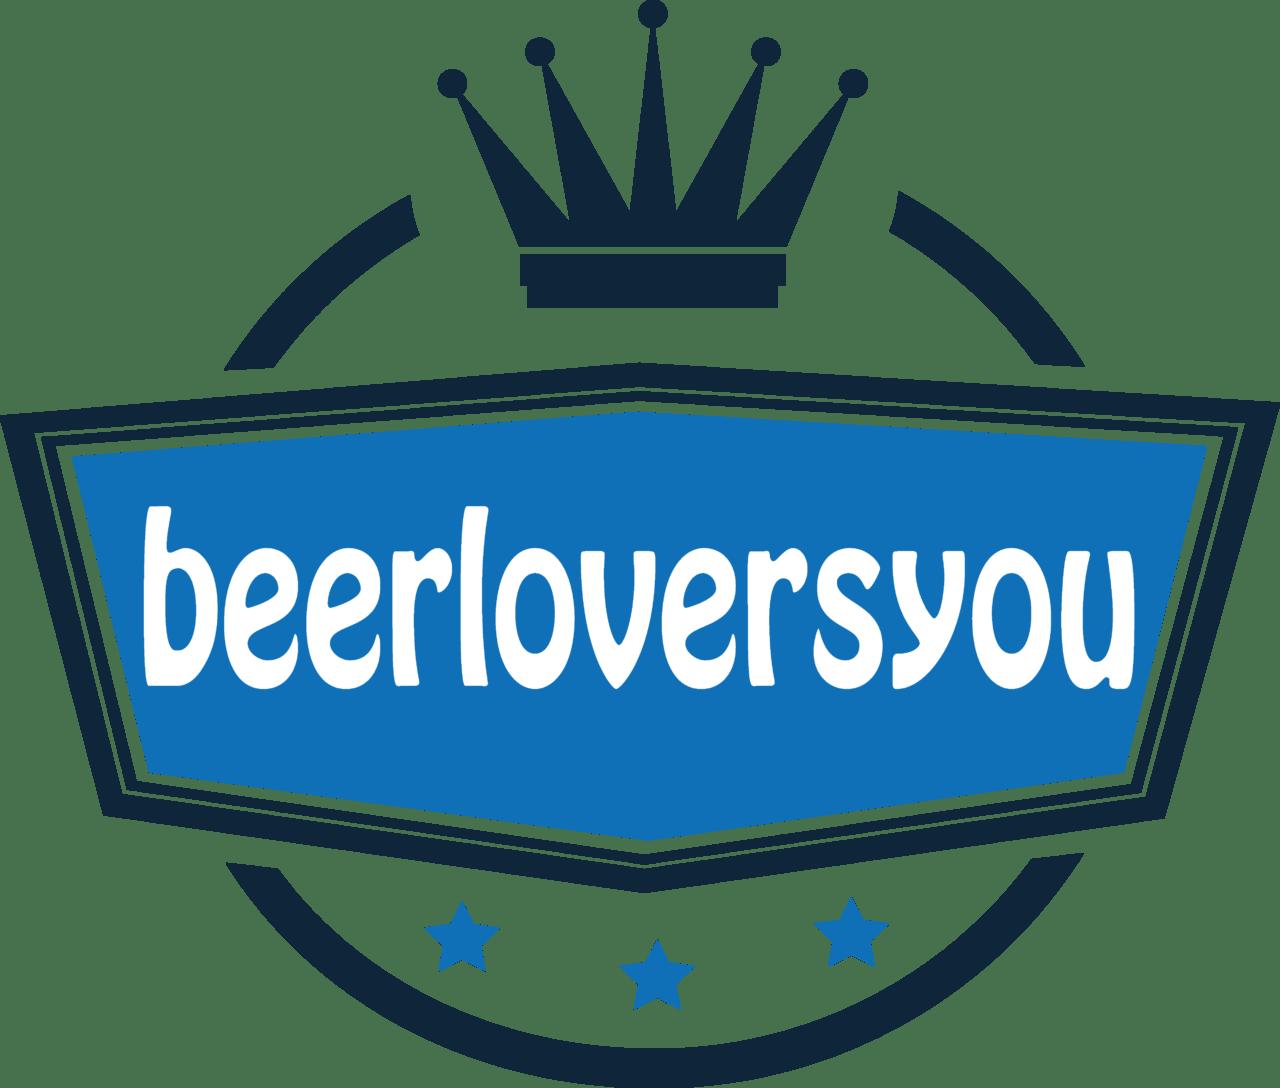 https://beerloversyou.ch/wp-content/uploads/2019/03/Logo-1-1-1280x1088.png